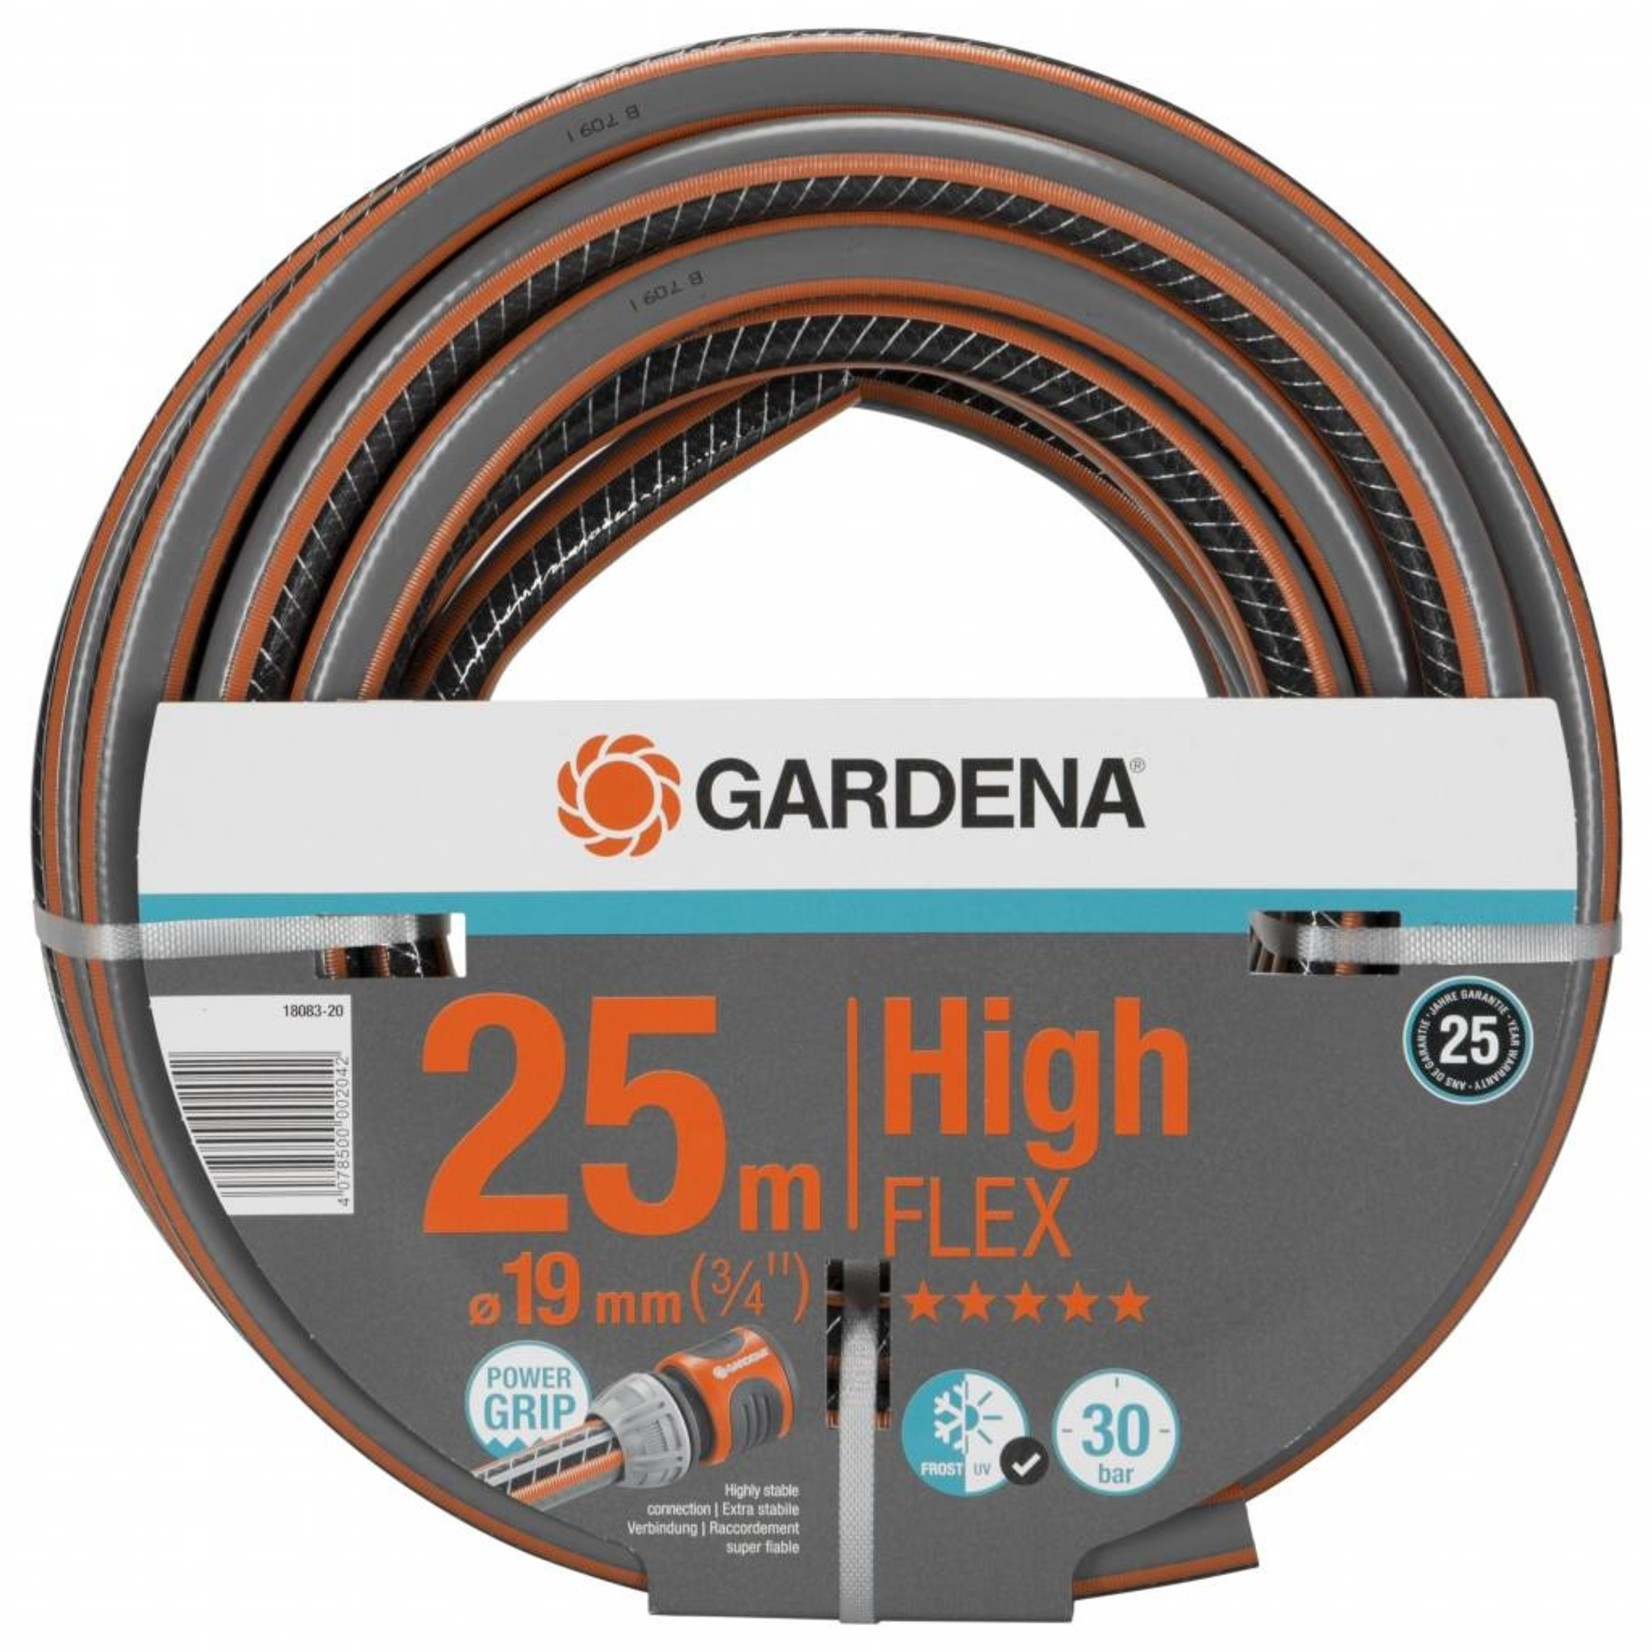 Gardena Gardena Comfort HighFLEX slang 25m/19mm